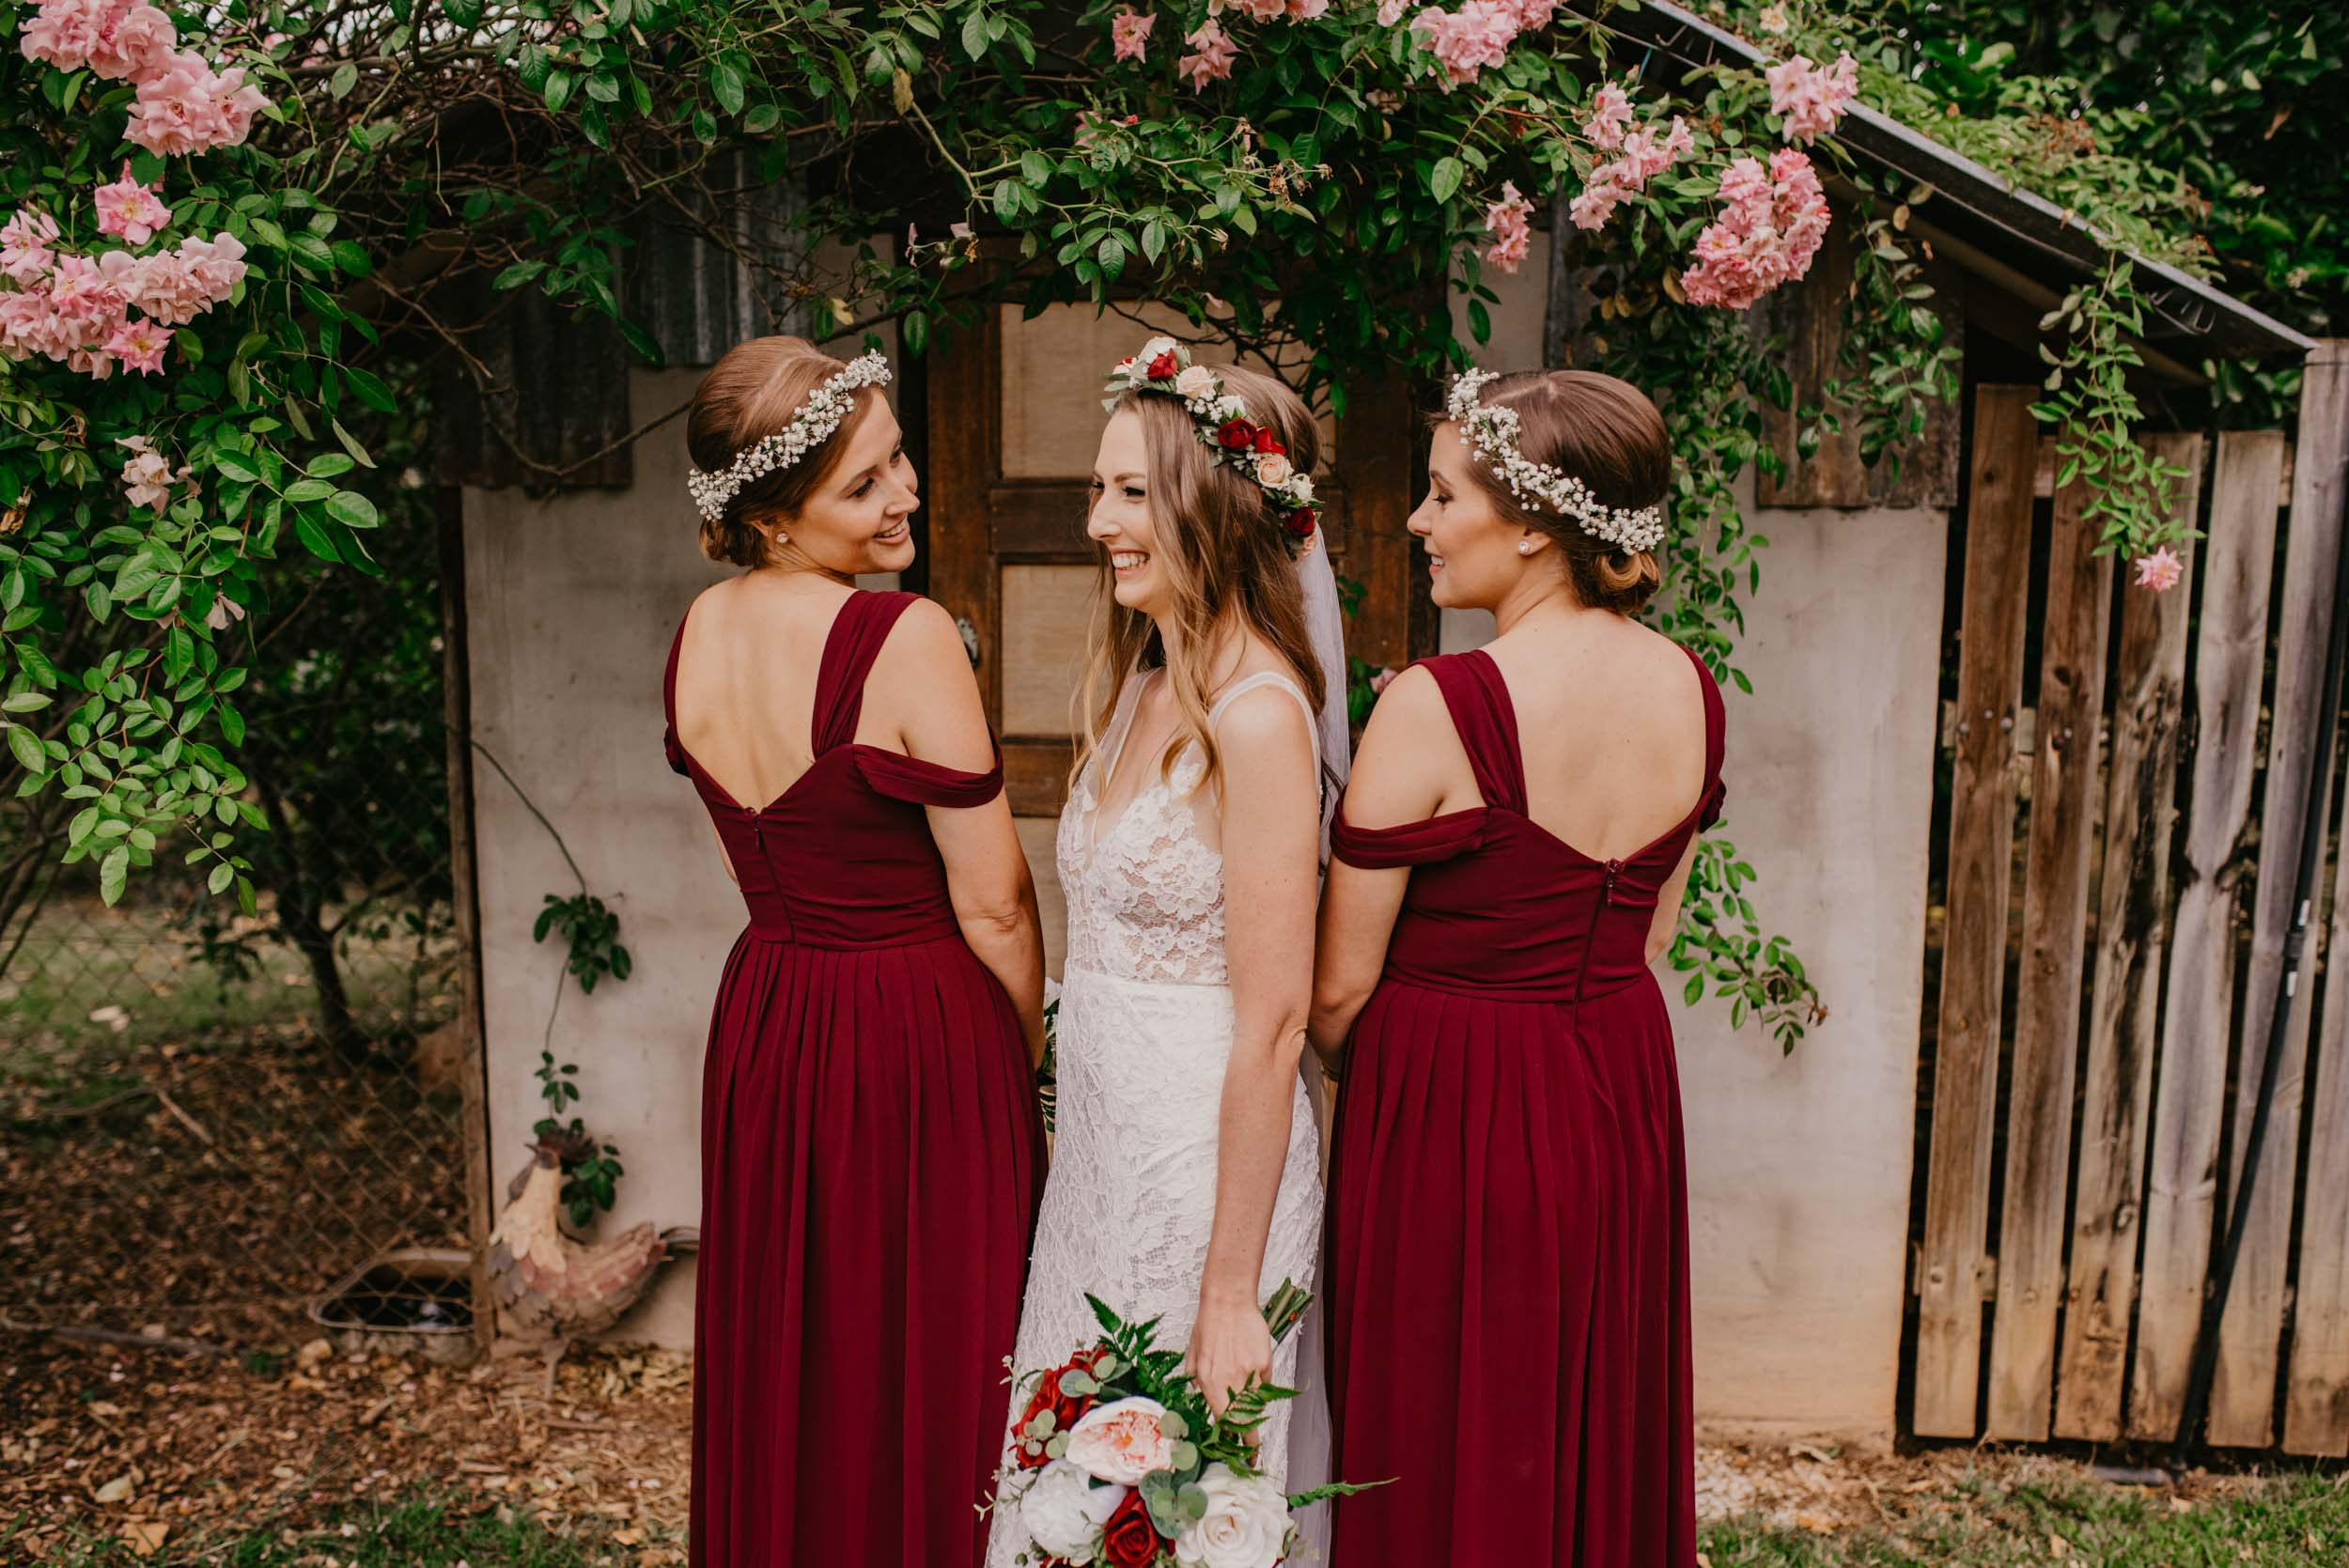 The Raw Photographer - Cairns Wedding Photographer - Laloli - Cairns Garden Ceremony - Cane Fields Photo Shoot-45.jpg